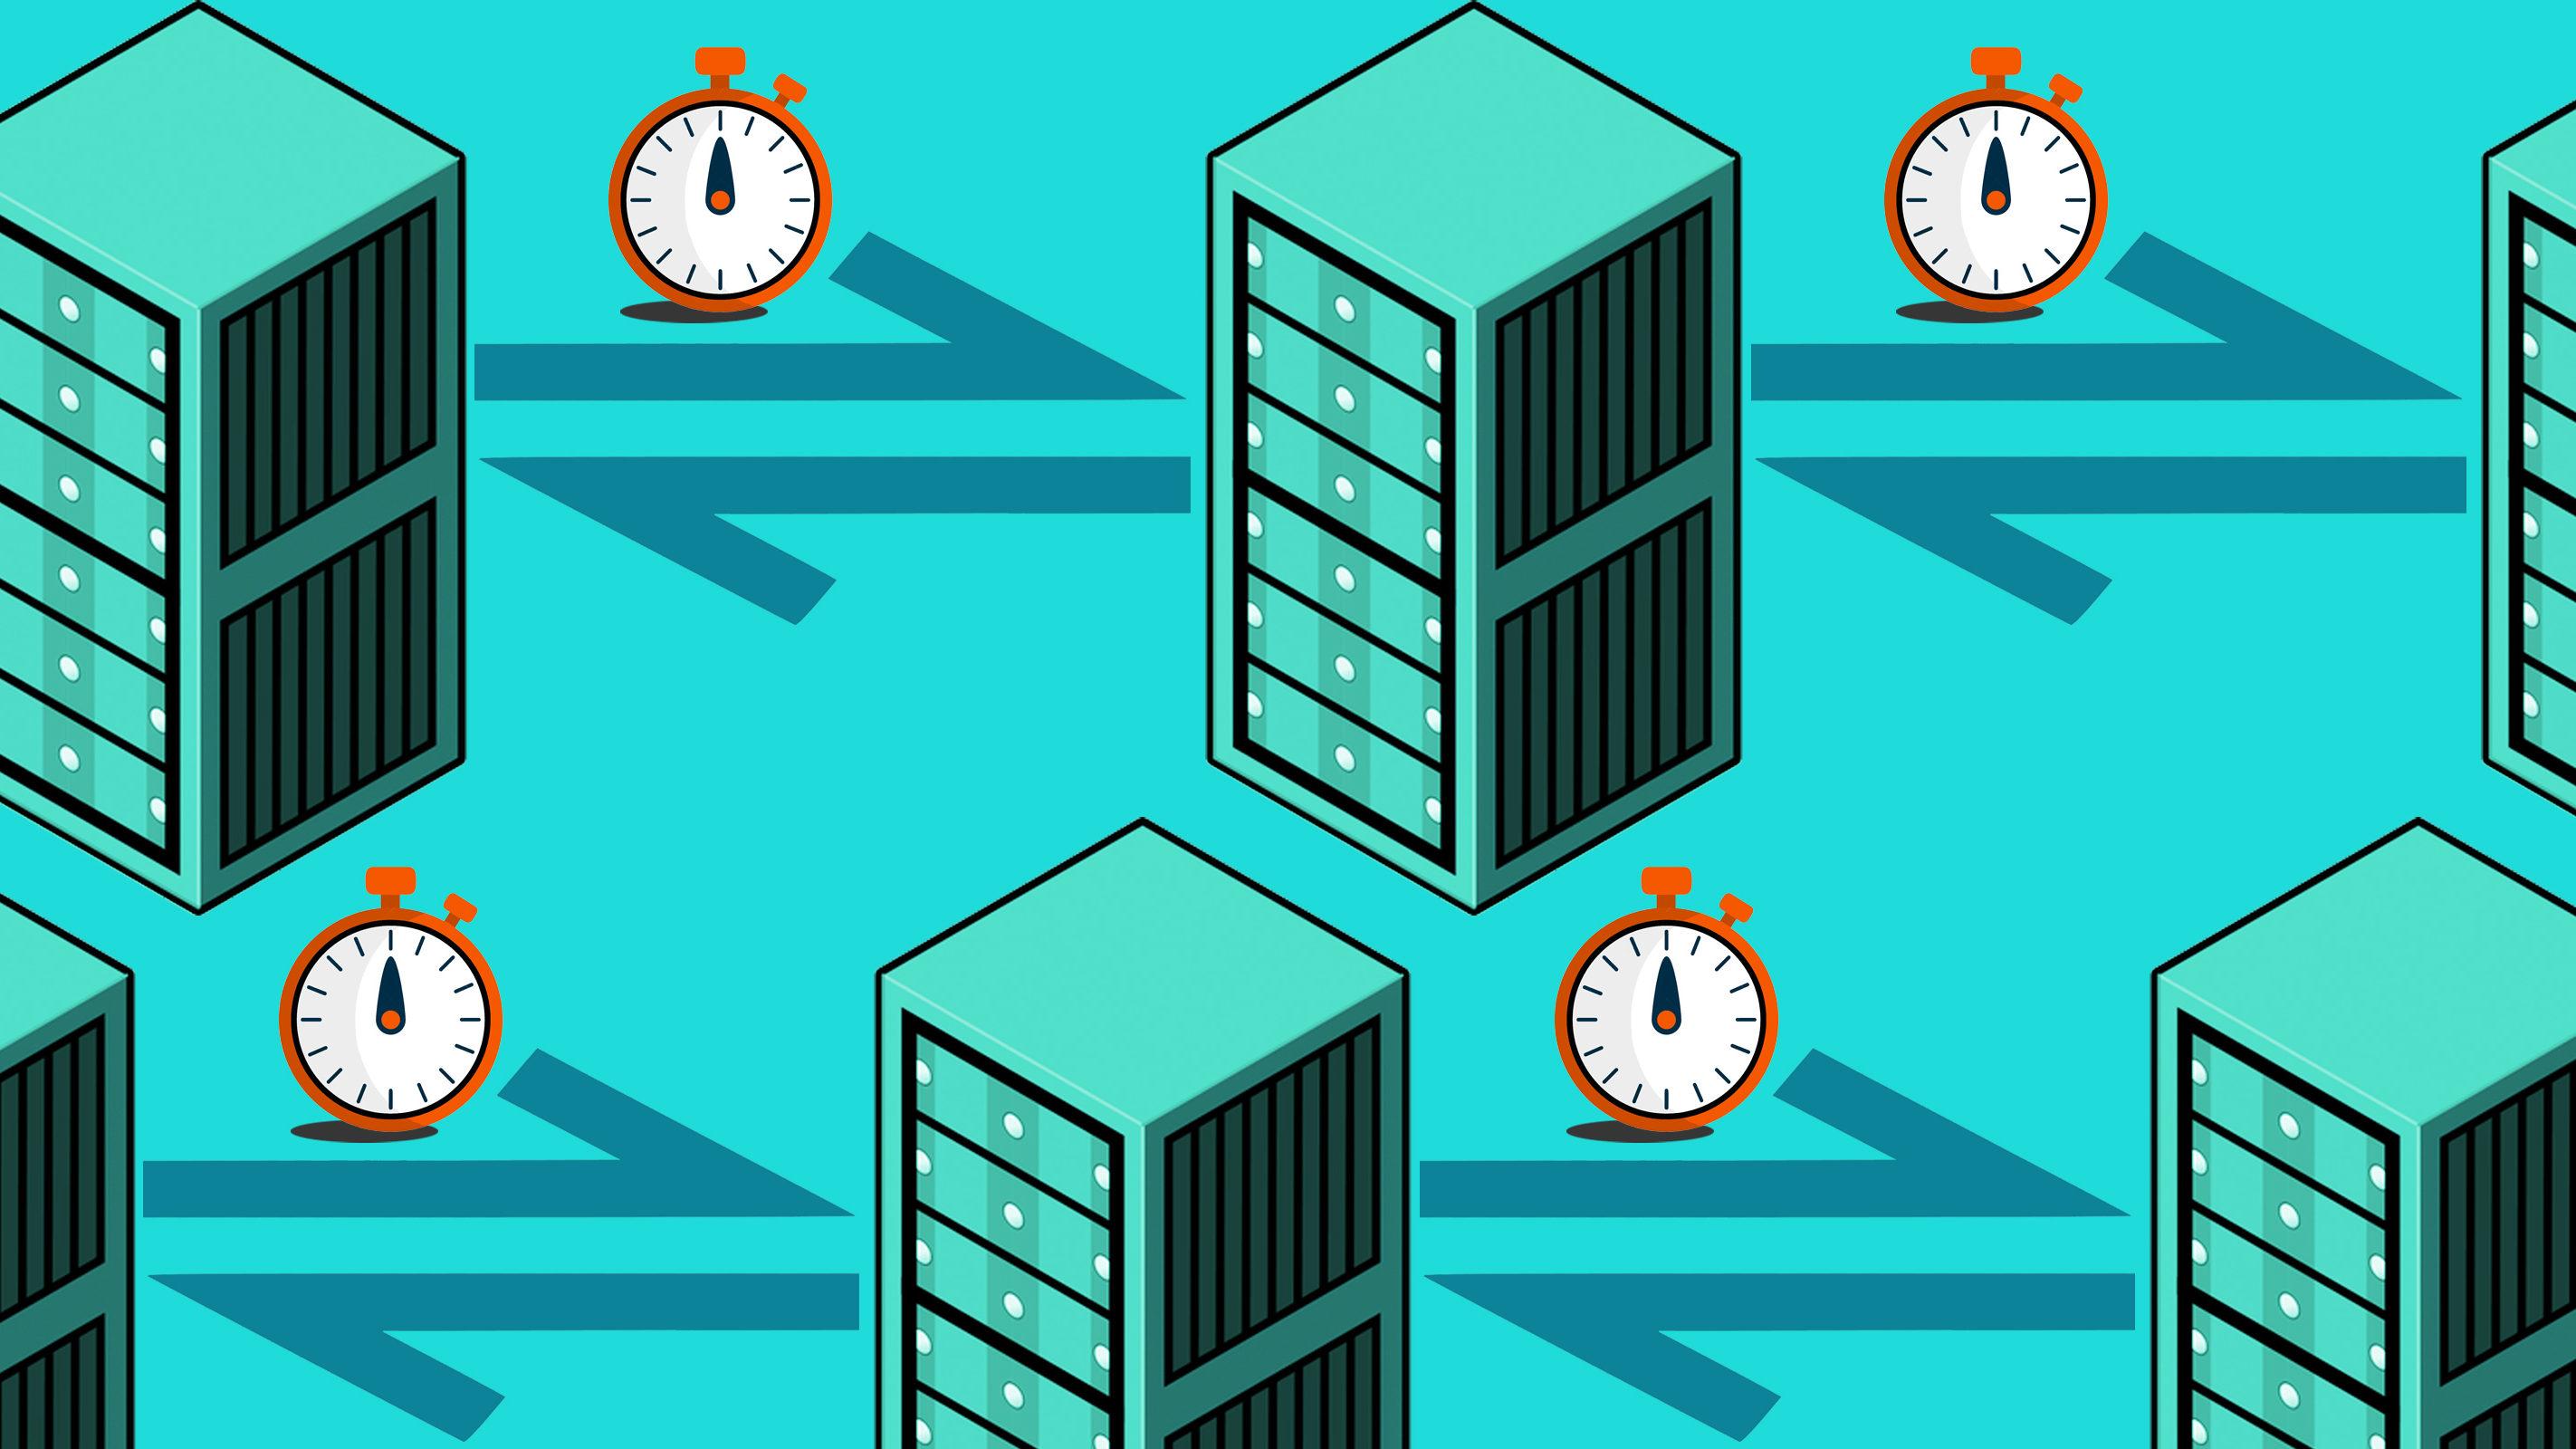 Server racks with network delay